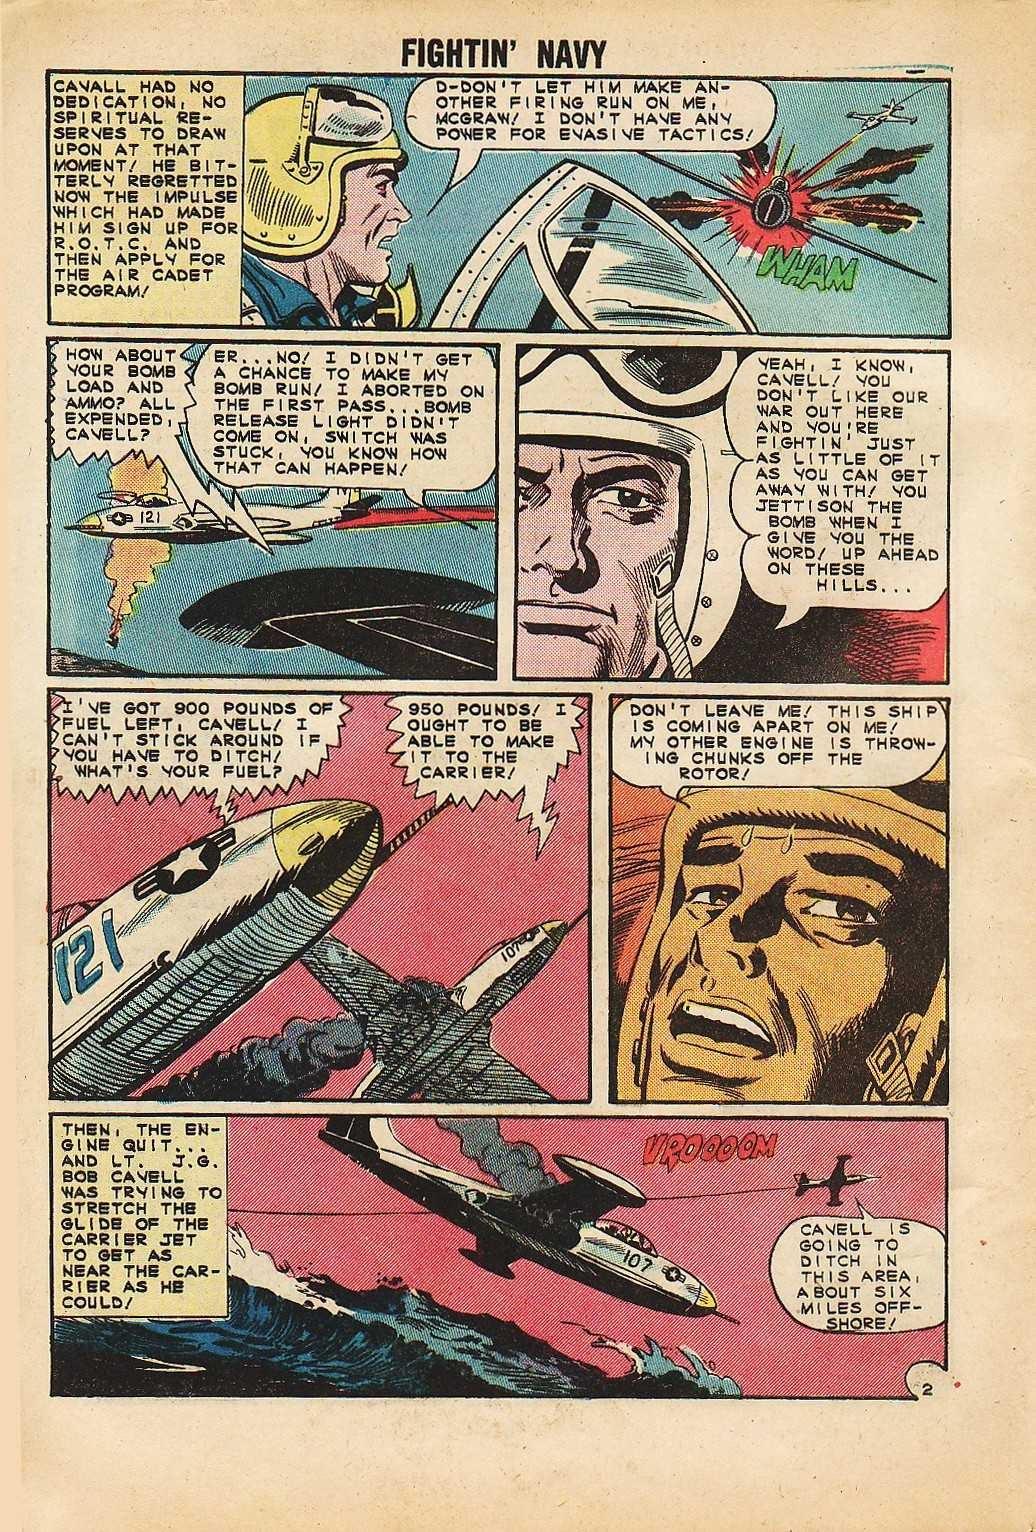 Read online Fightin' Navy comic -  Issue #116 - 4